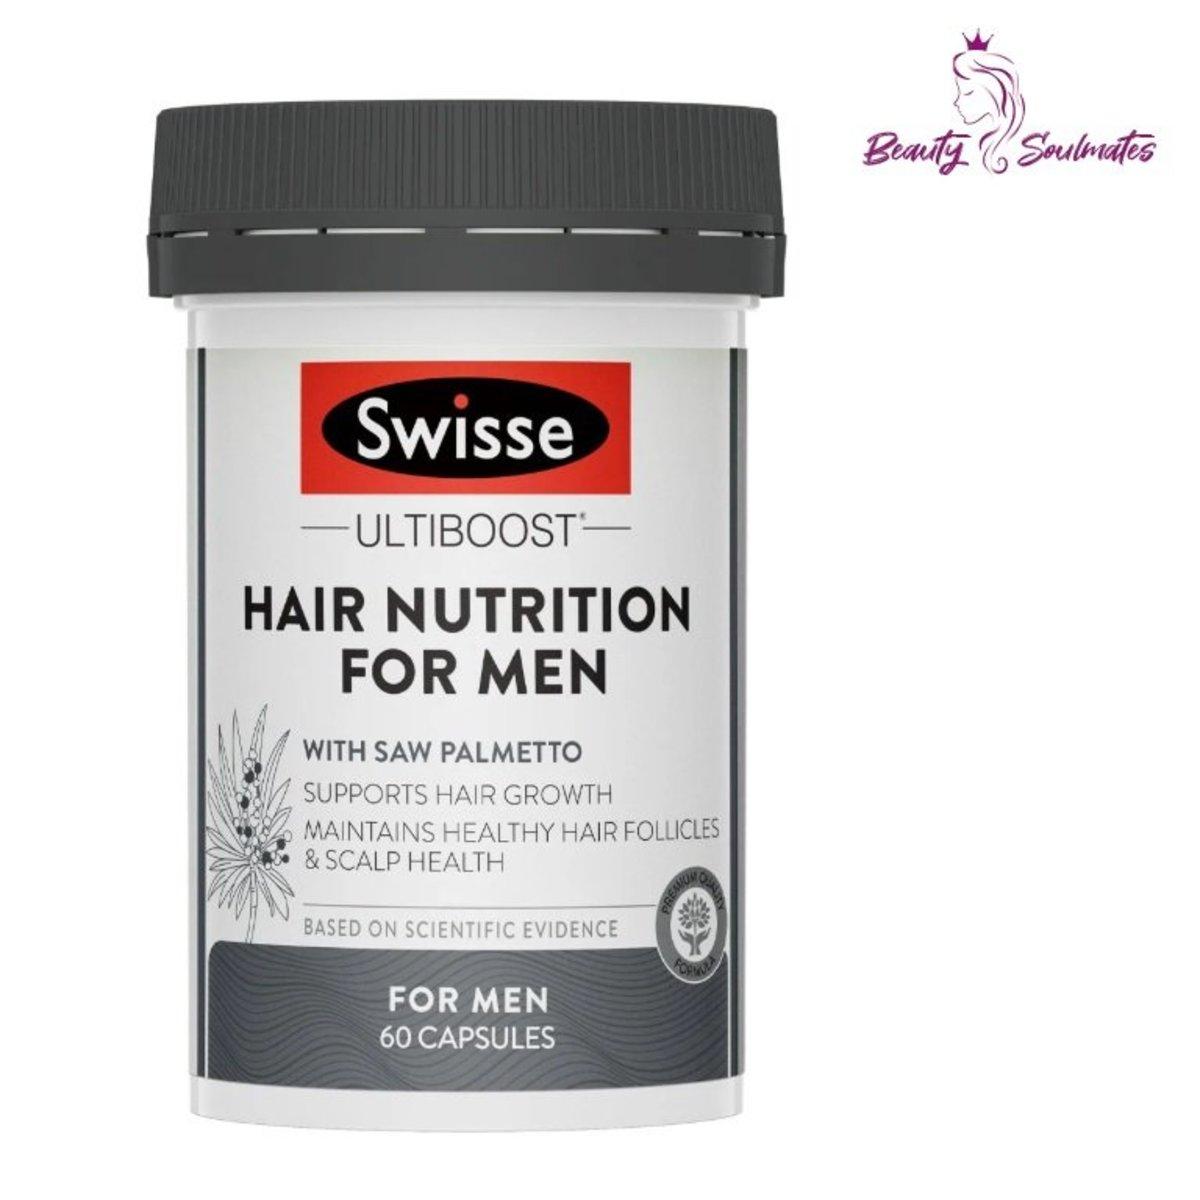 Ultiboost Hair Nutrition For Men 60caps